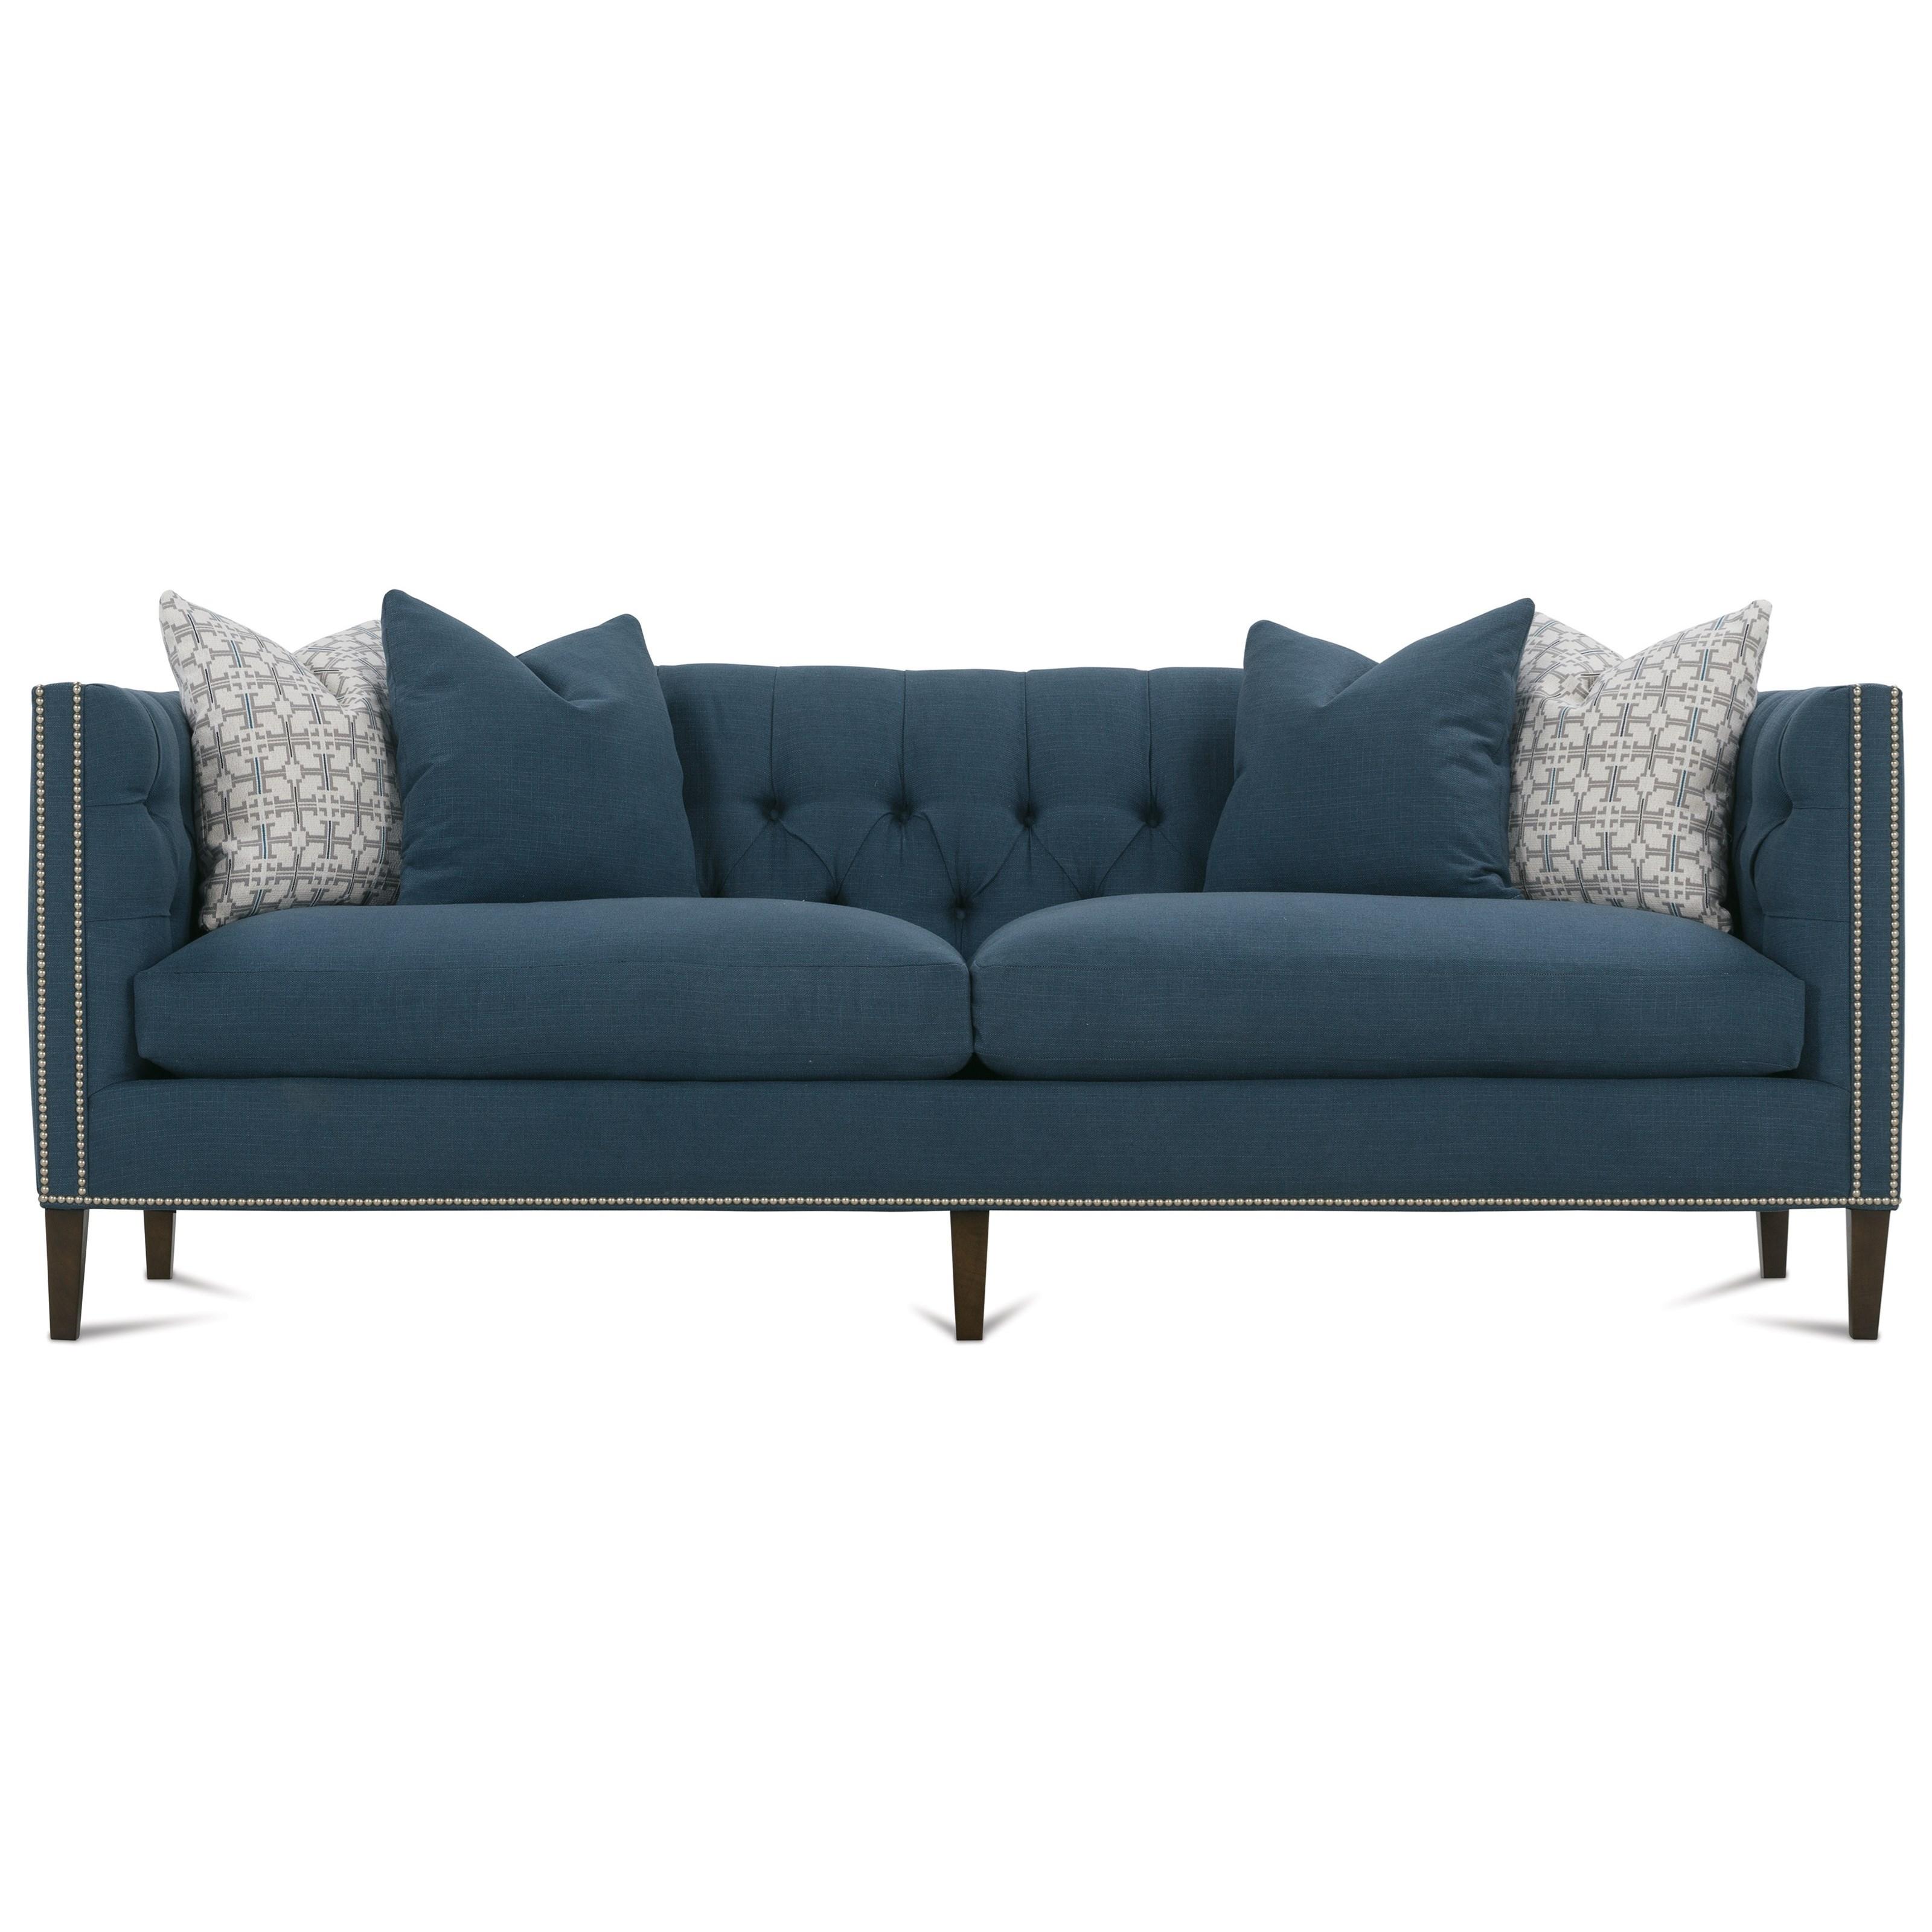 Brette 2 Cushion Sofa by Robin Bruce at Steger's Furniture